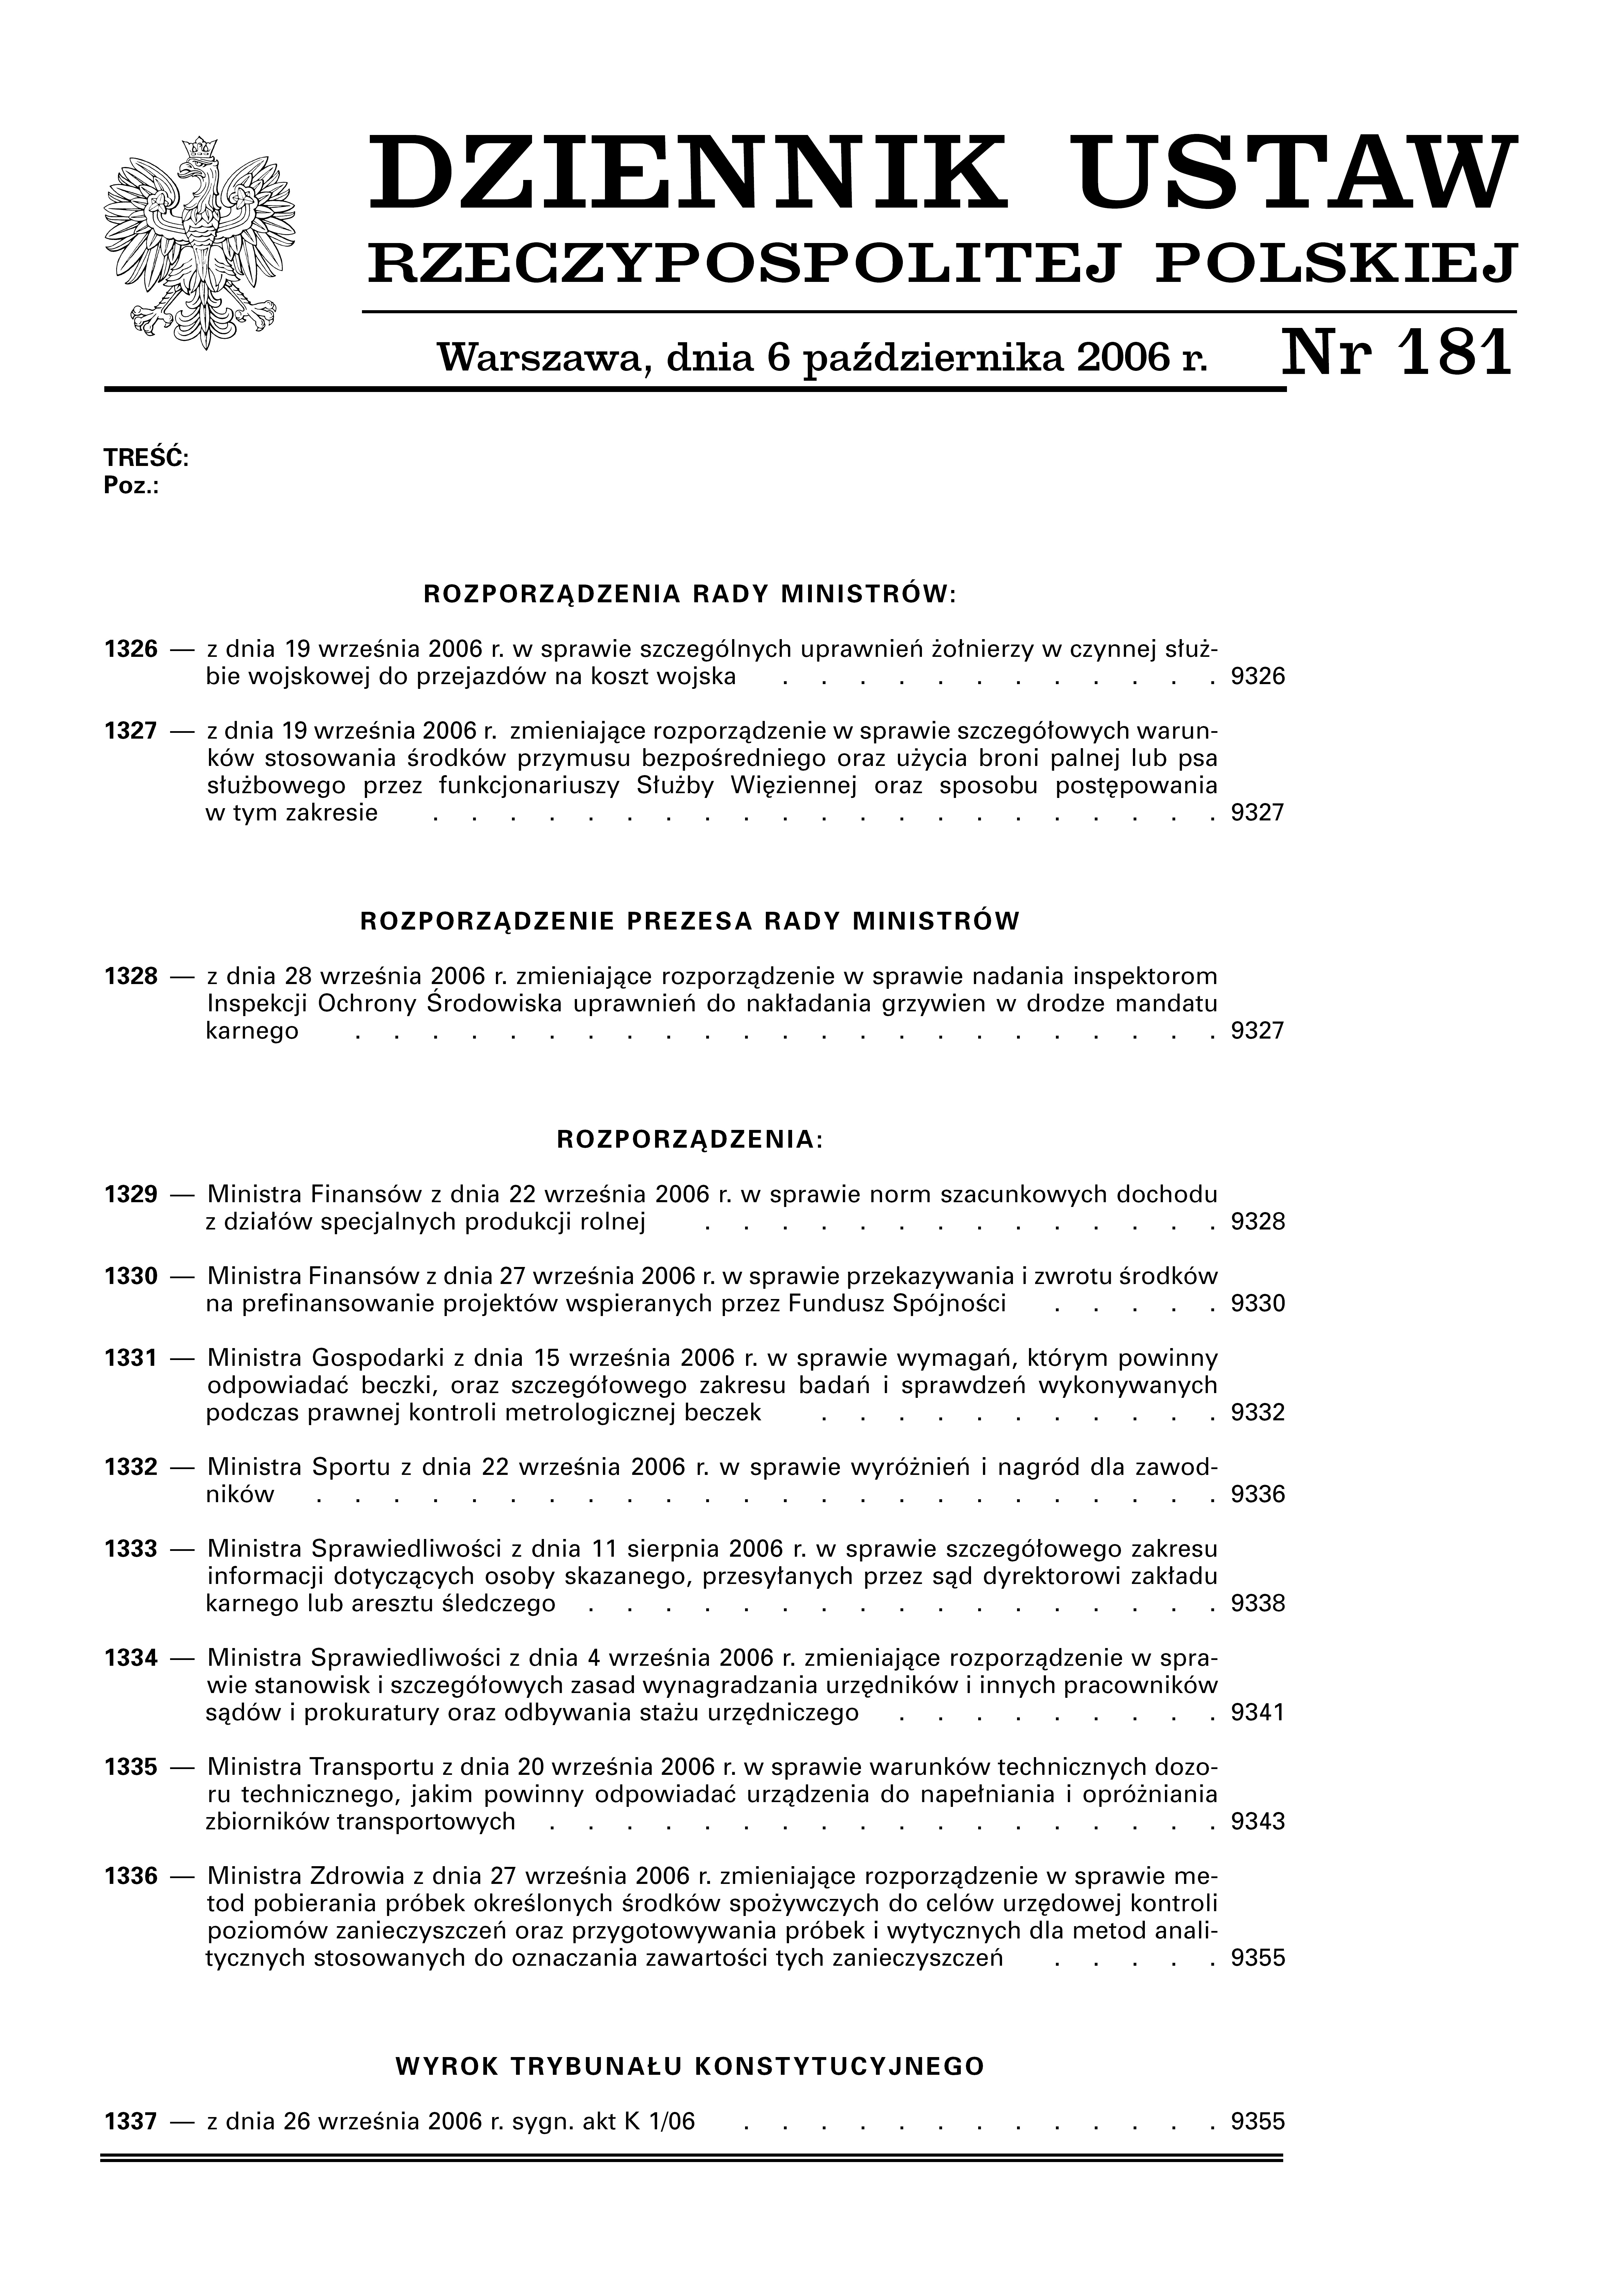 07ea7725e53402 Dziennik Ustaw – Wikipedia, wolna encyklopedia